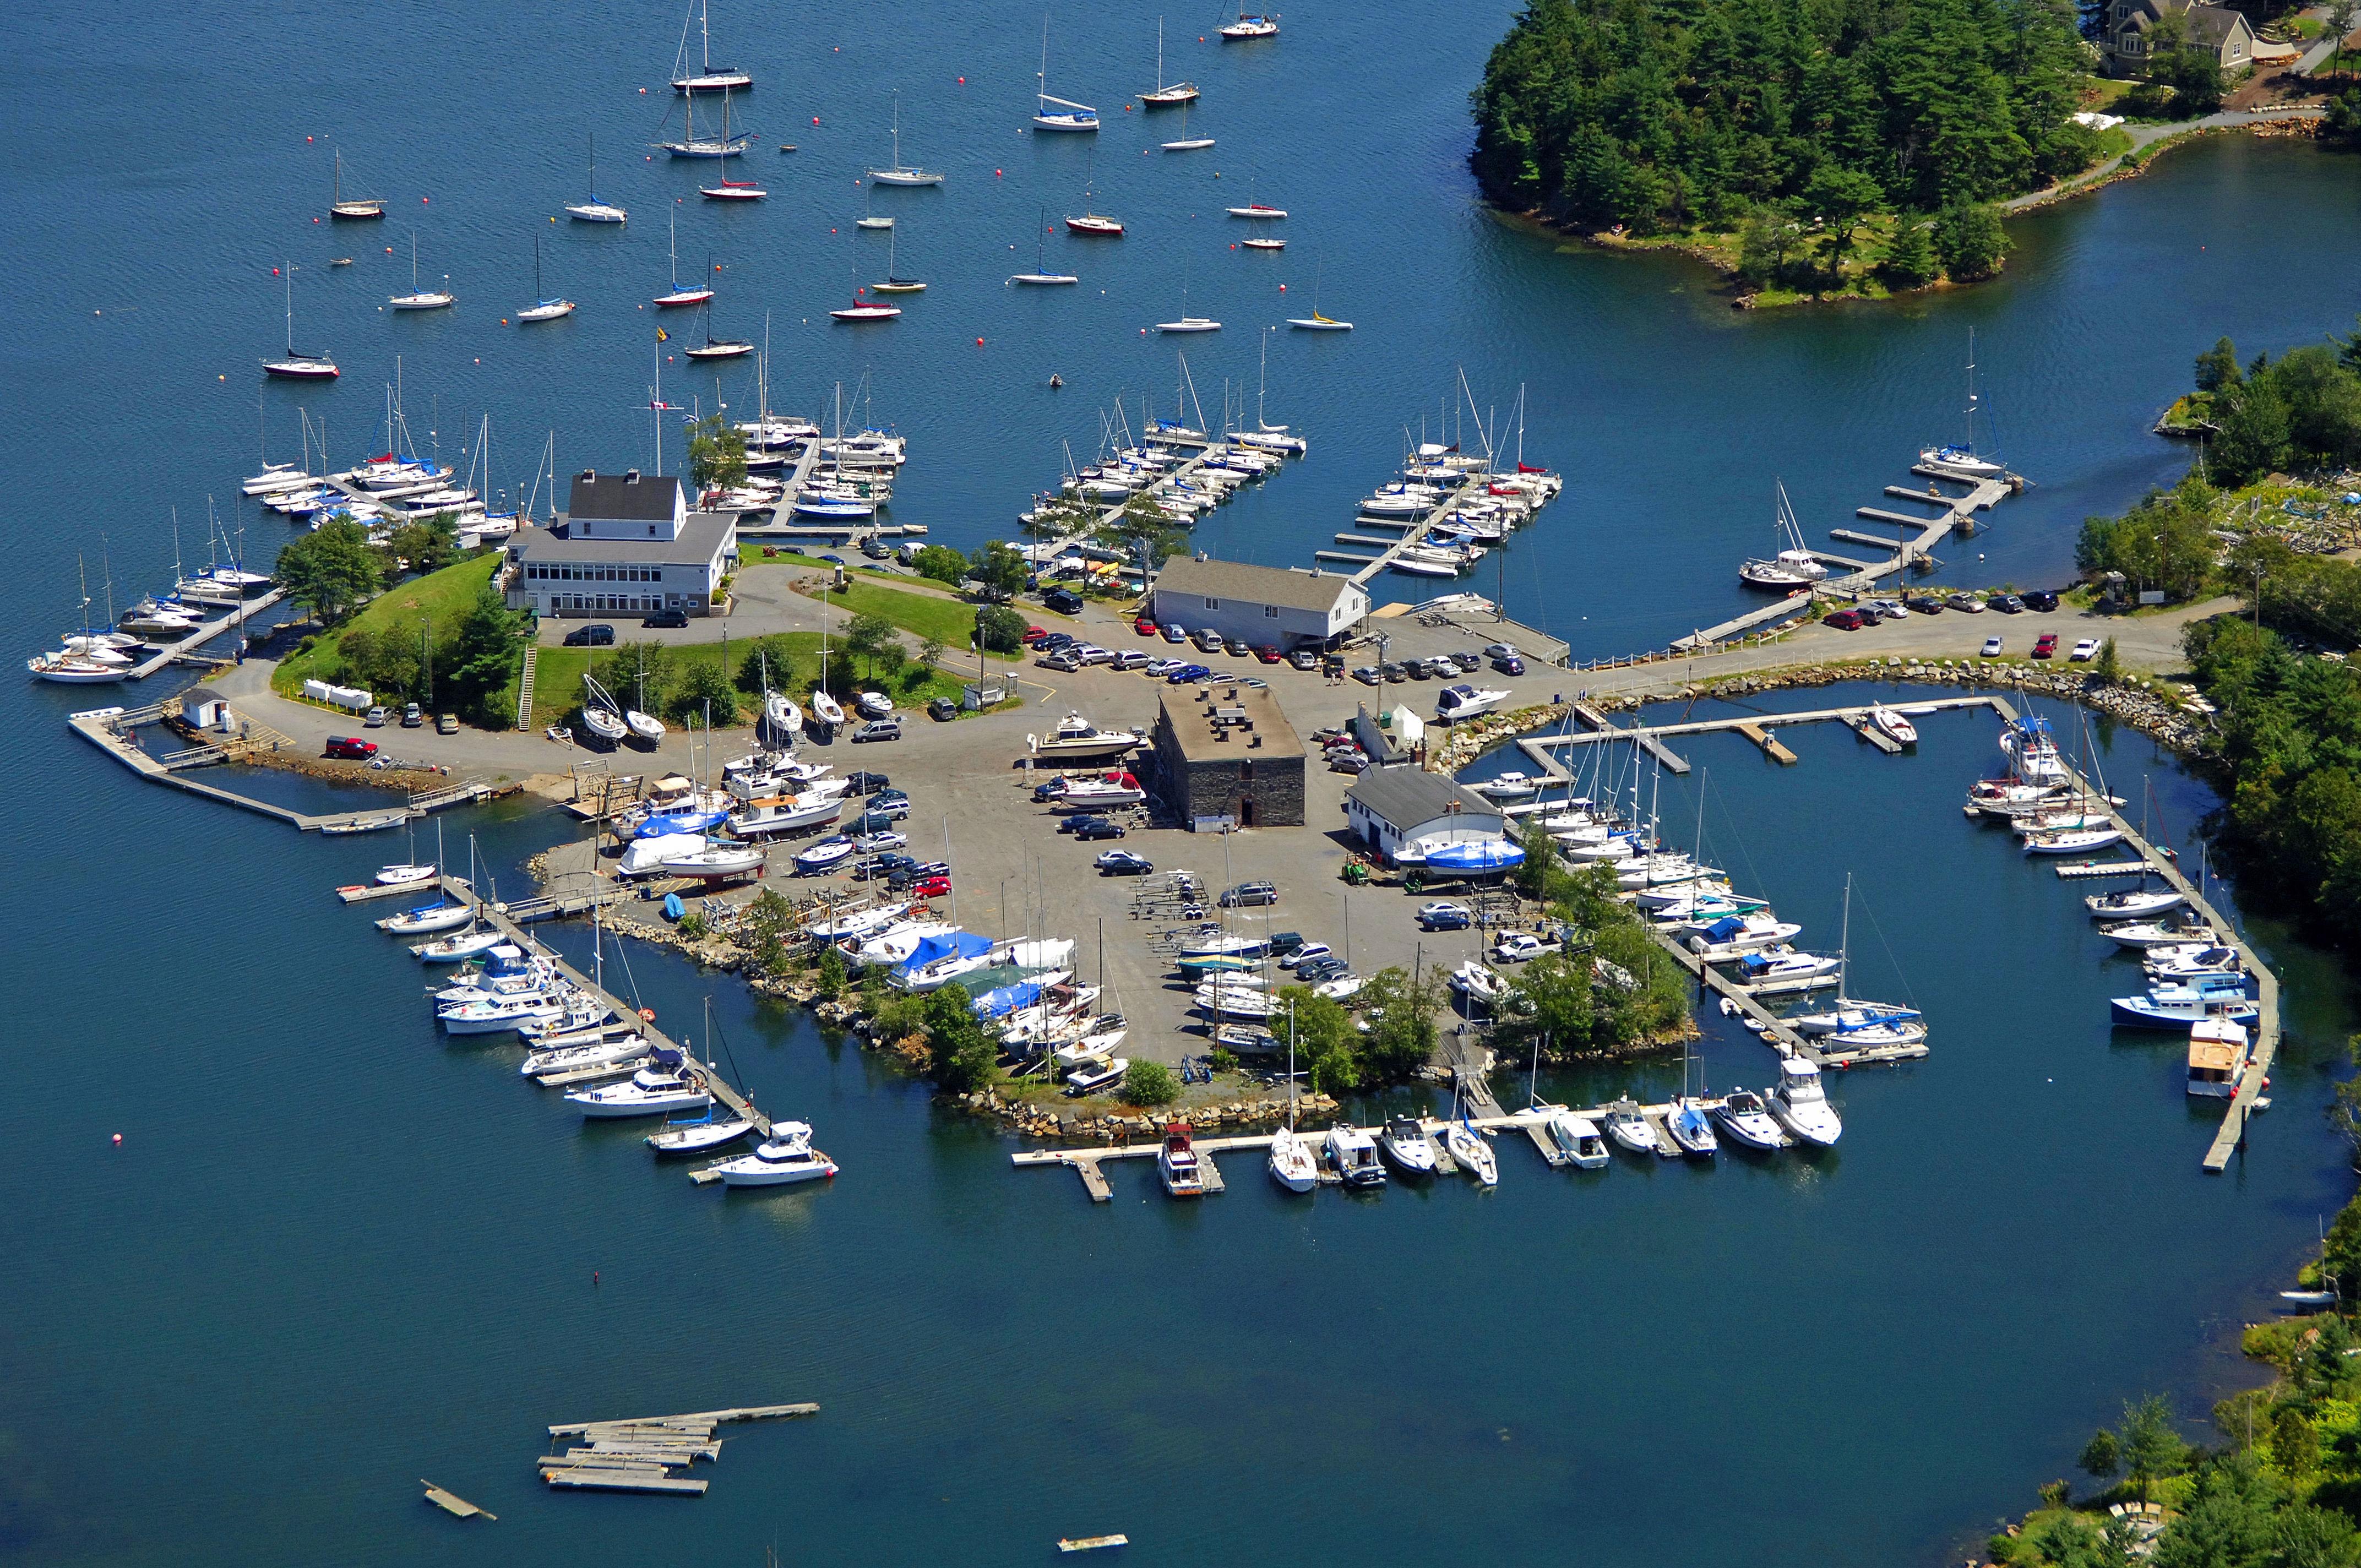 Armdale Yacht Club Marina in Halifax, NS, Canada - Marina Reviews